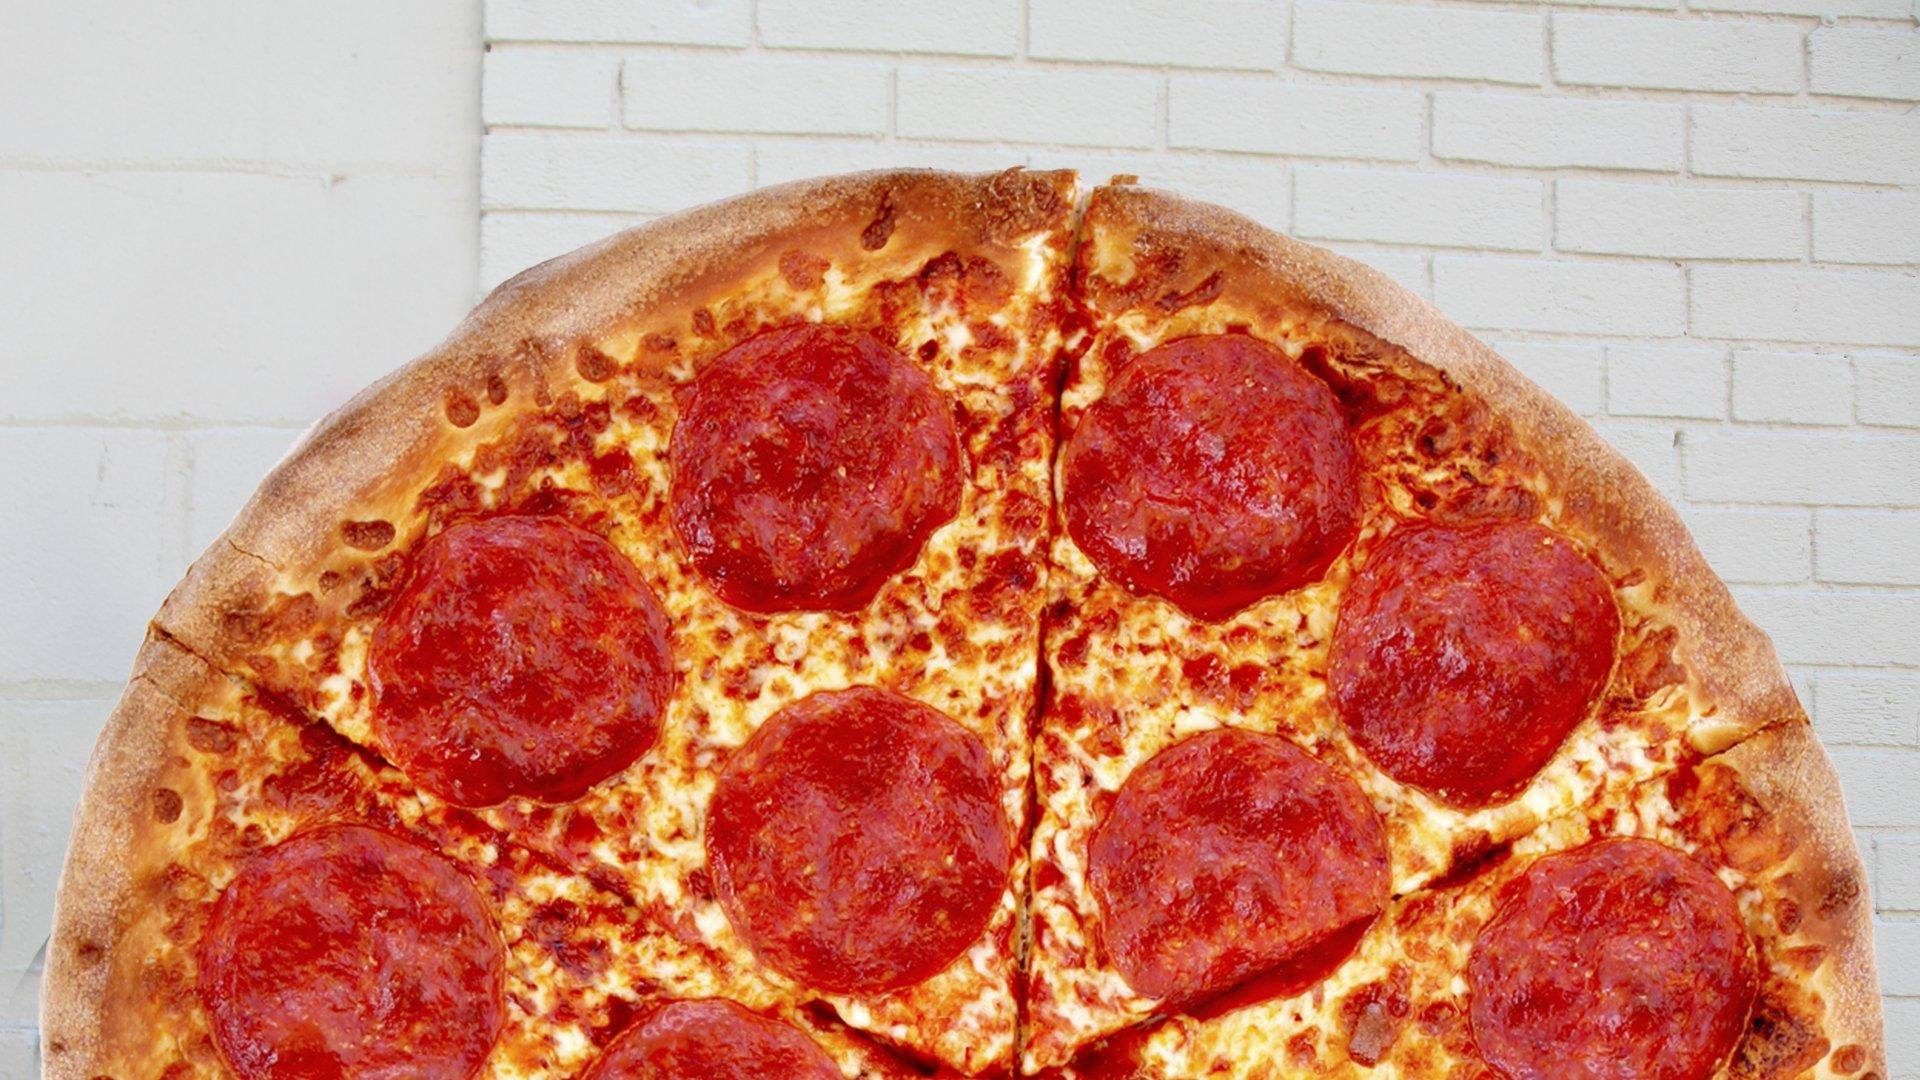 Episode 7: Pizza